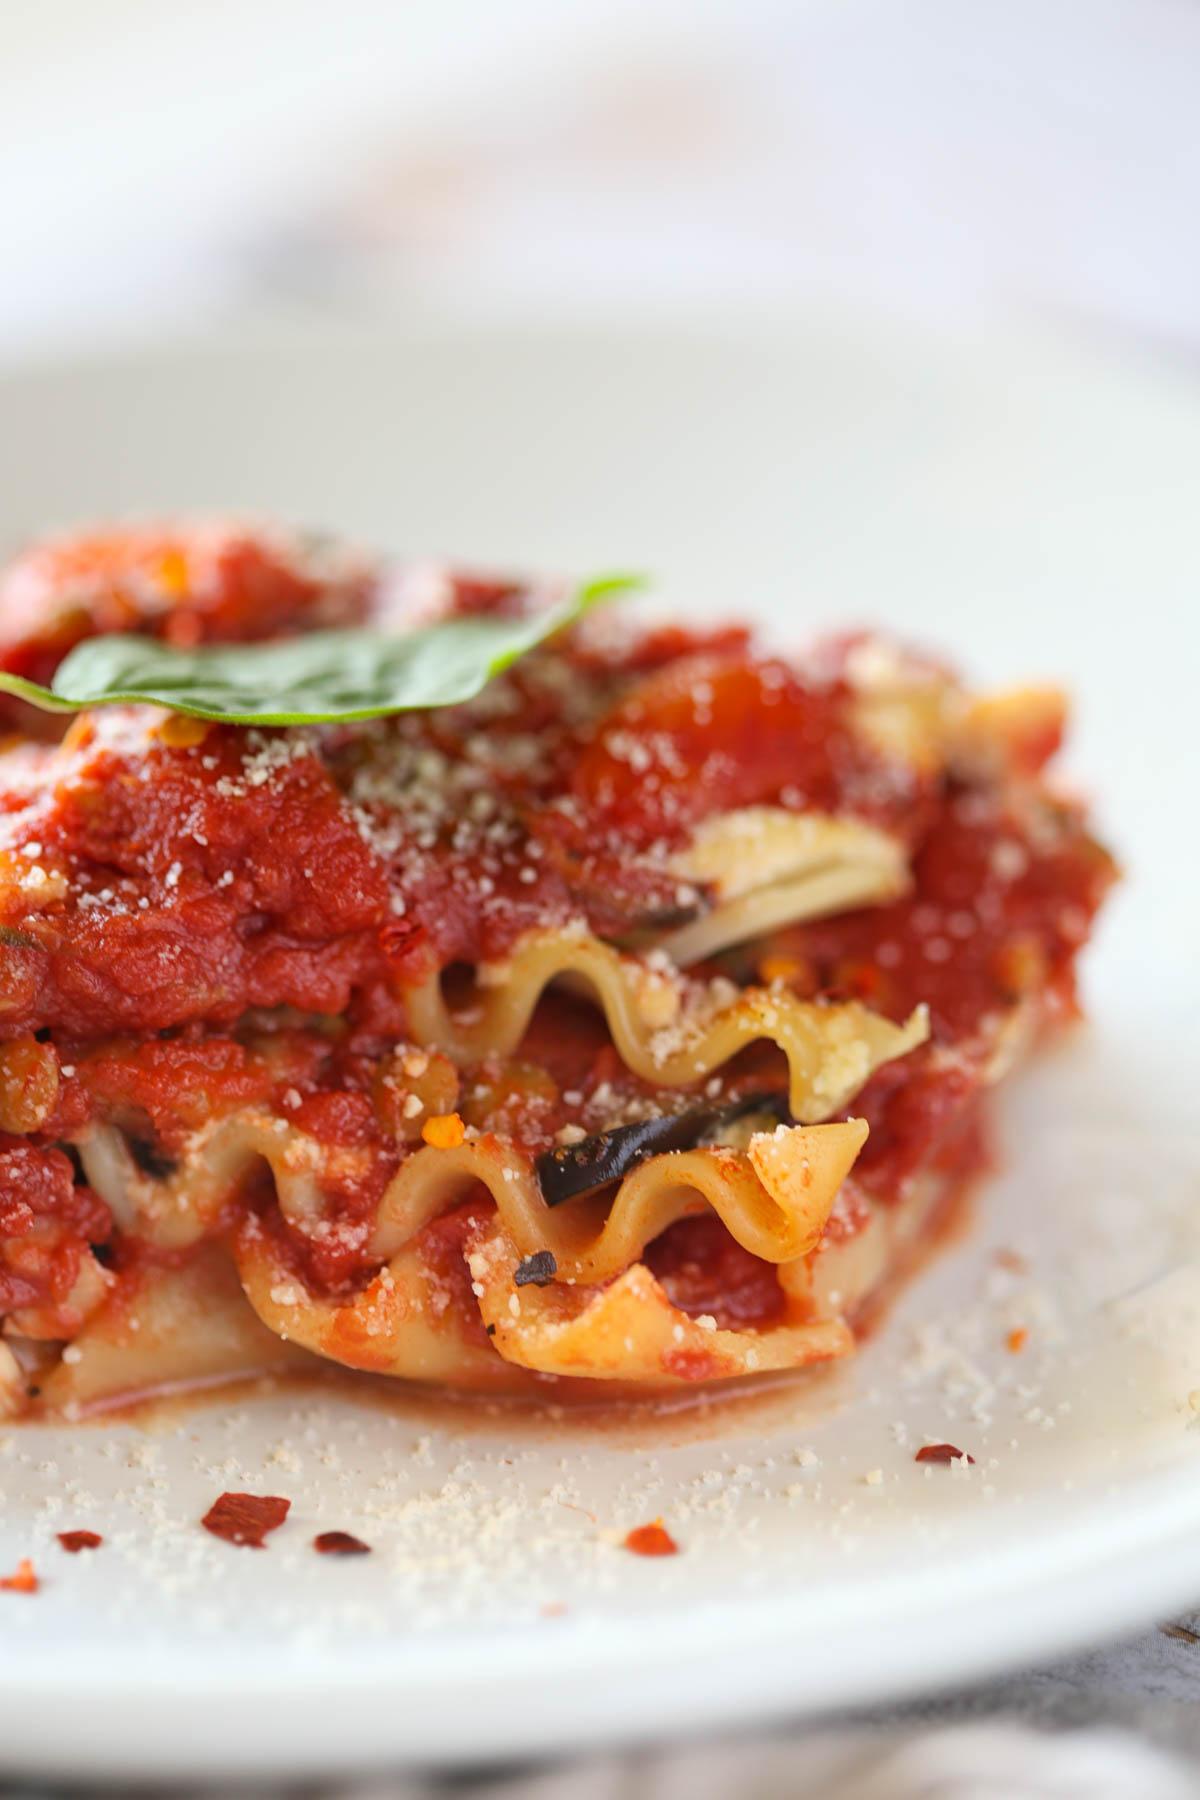 Italian Vegetable Vegan Lasagna with Lentil Bolognese and Roasted Vegetables Easy Almond Tofu Ricotta Recipe